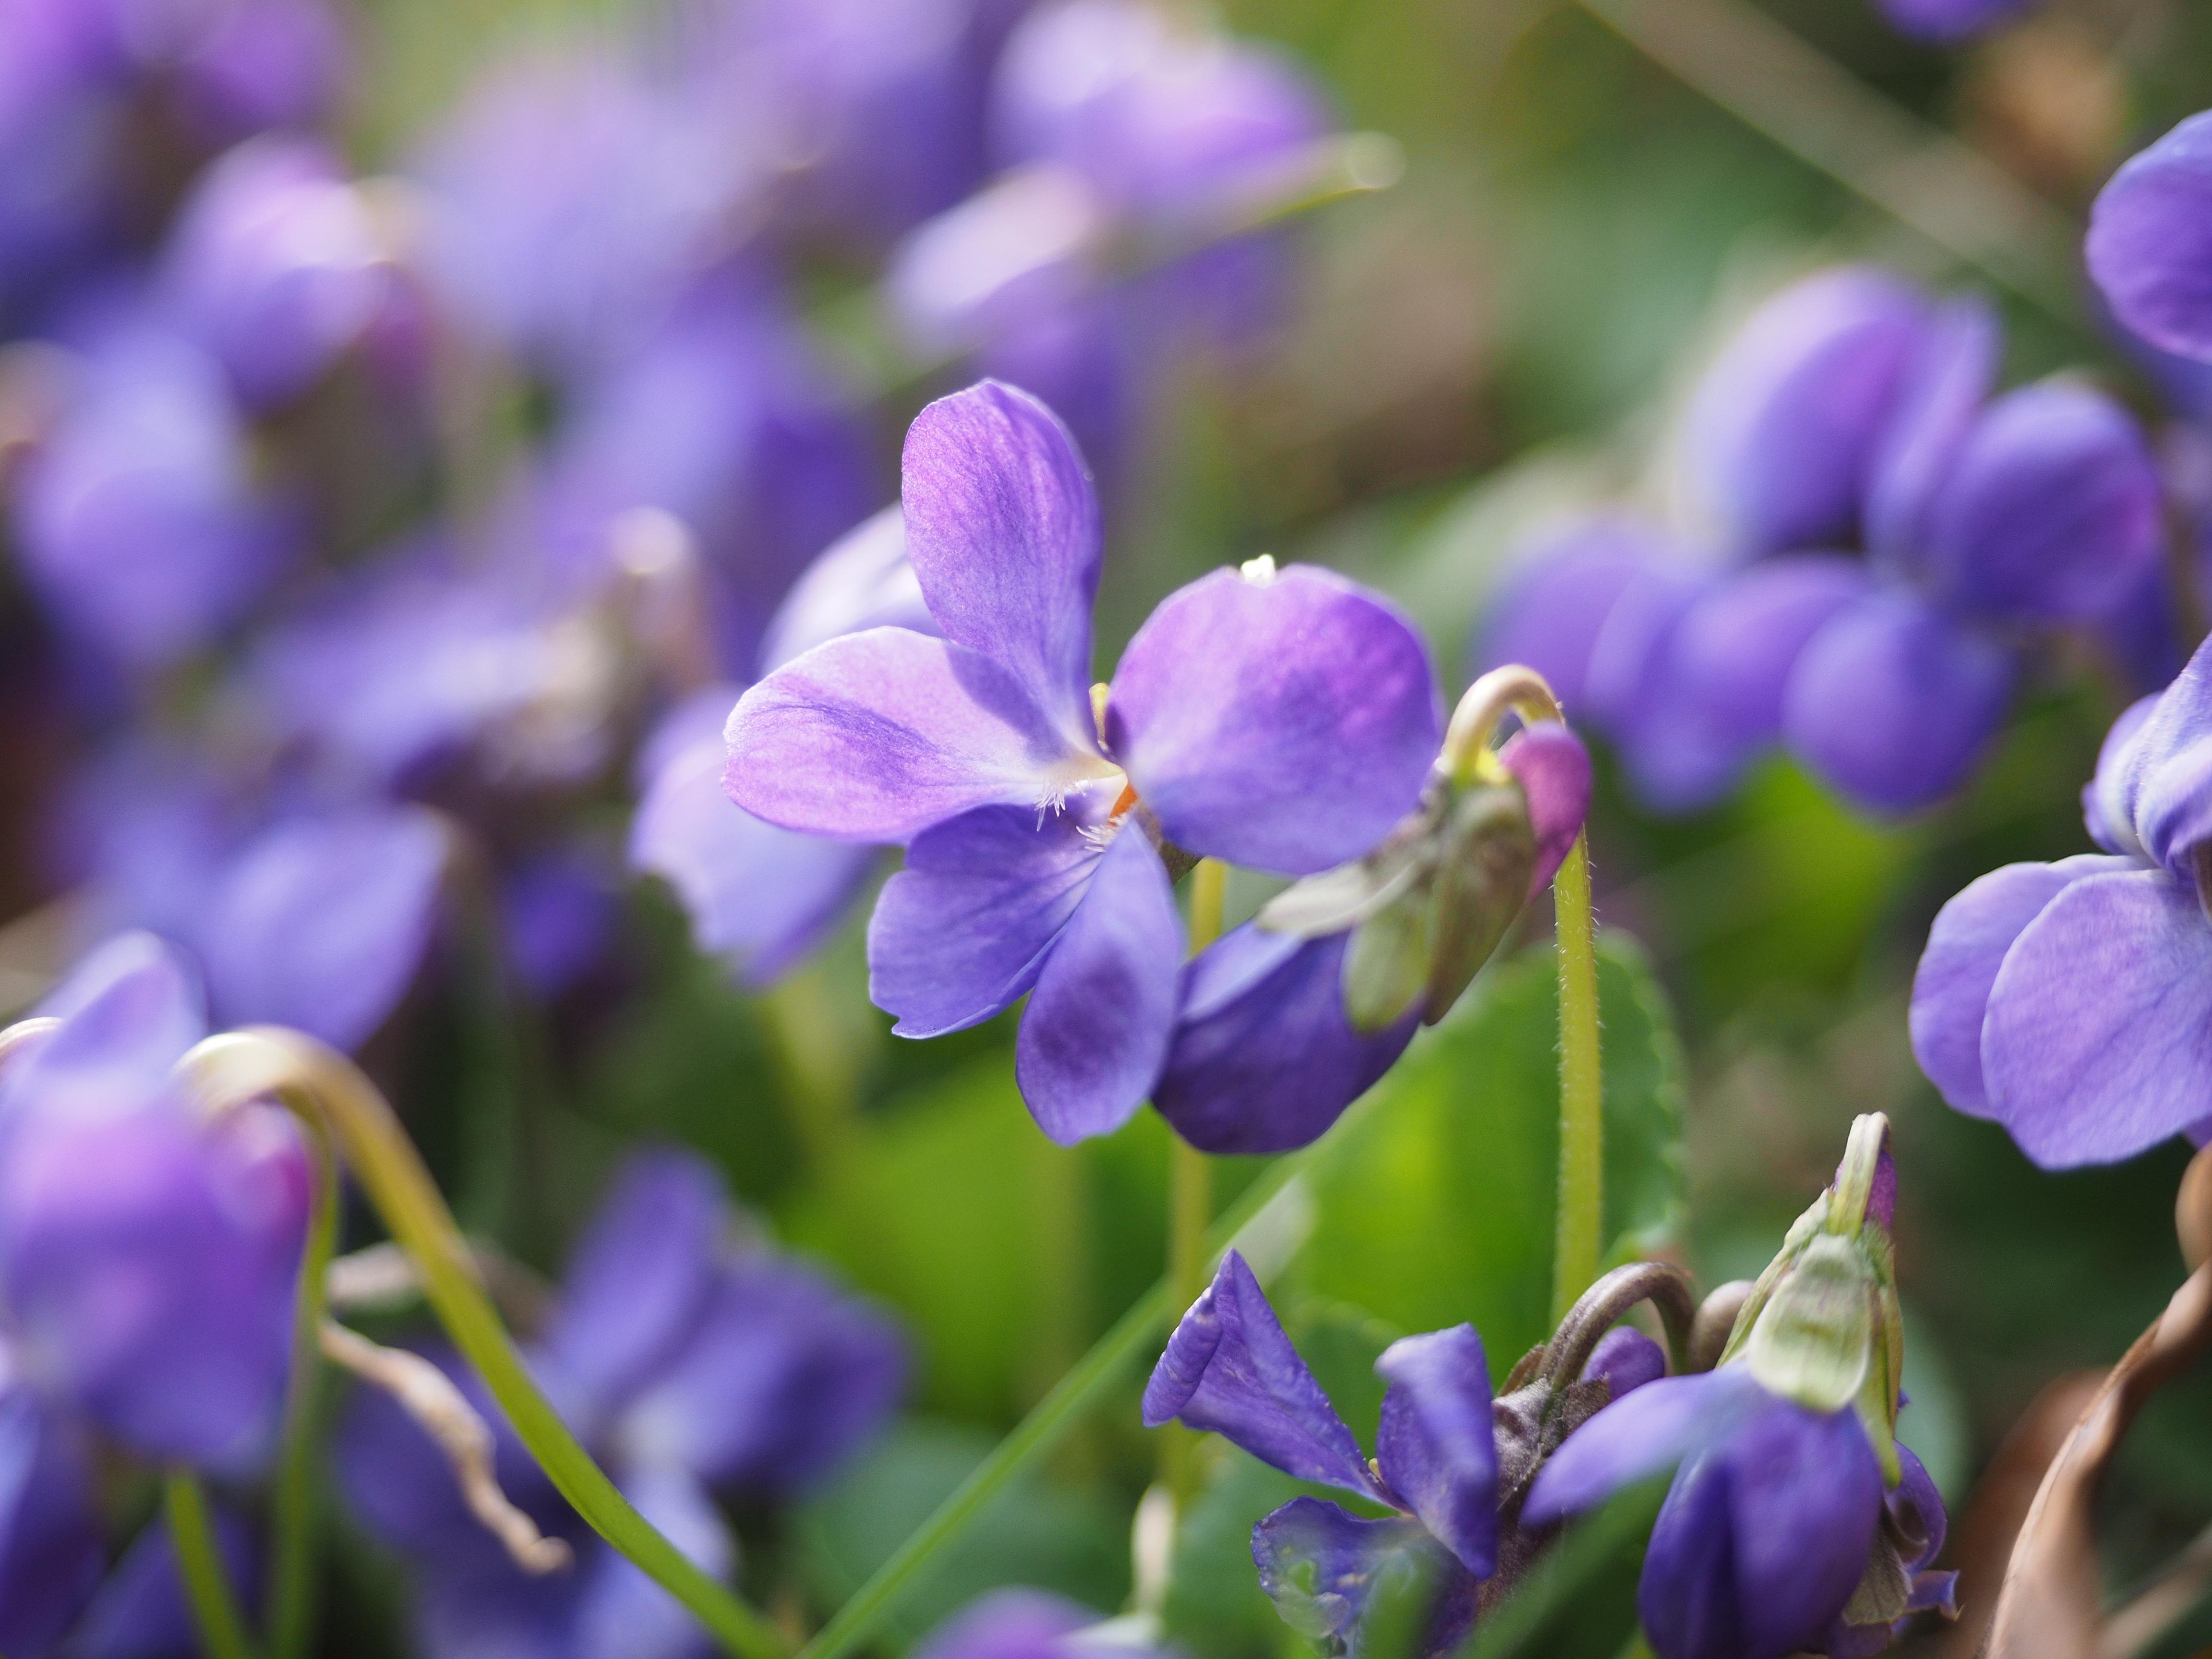 free images nature forest blossom flower purple petal